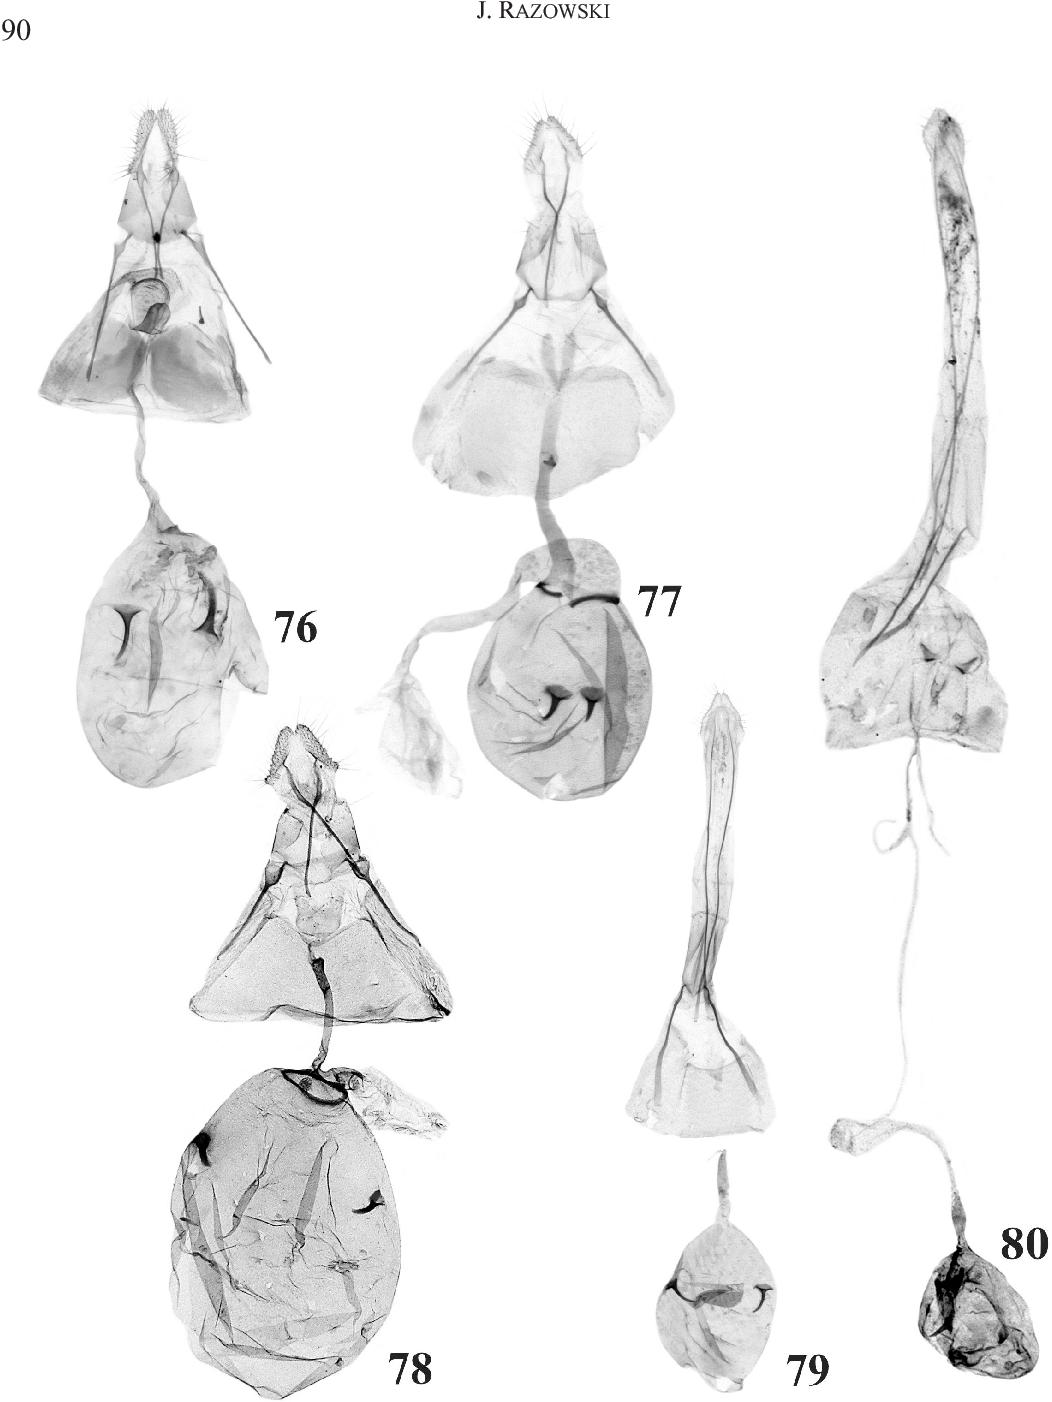 figure 76-80